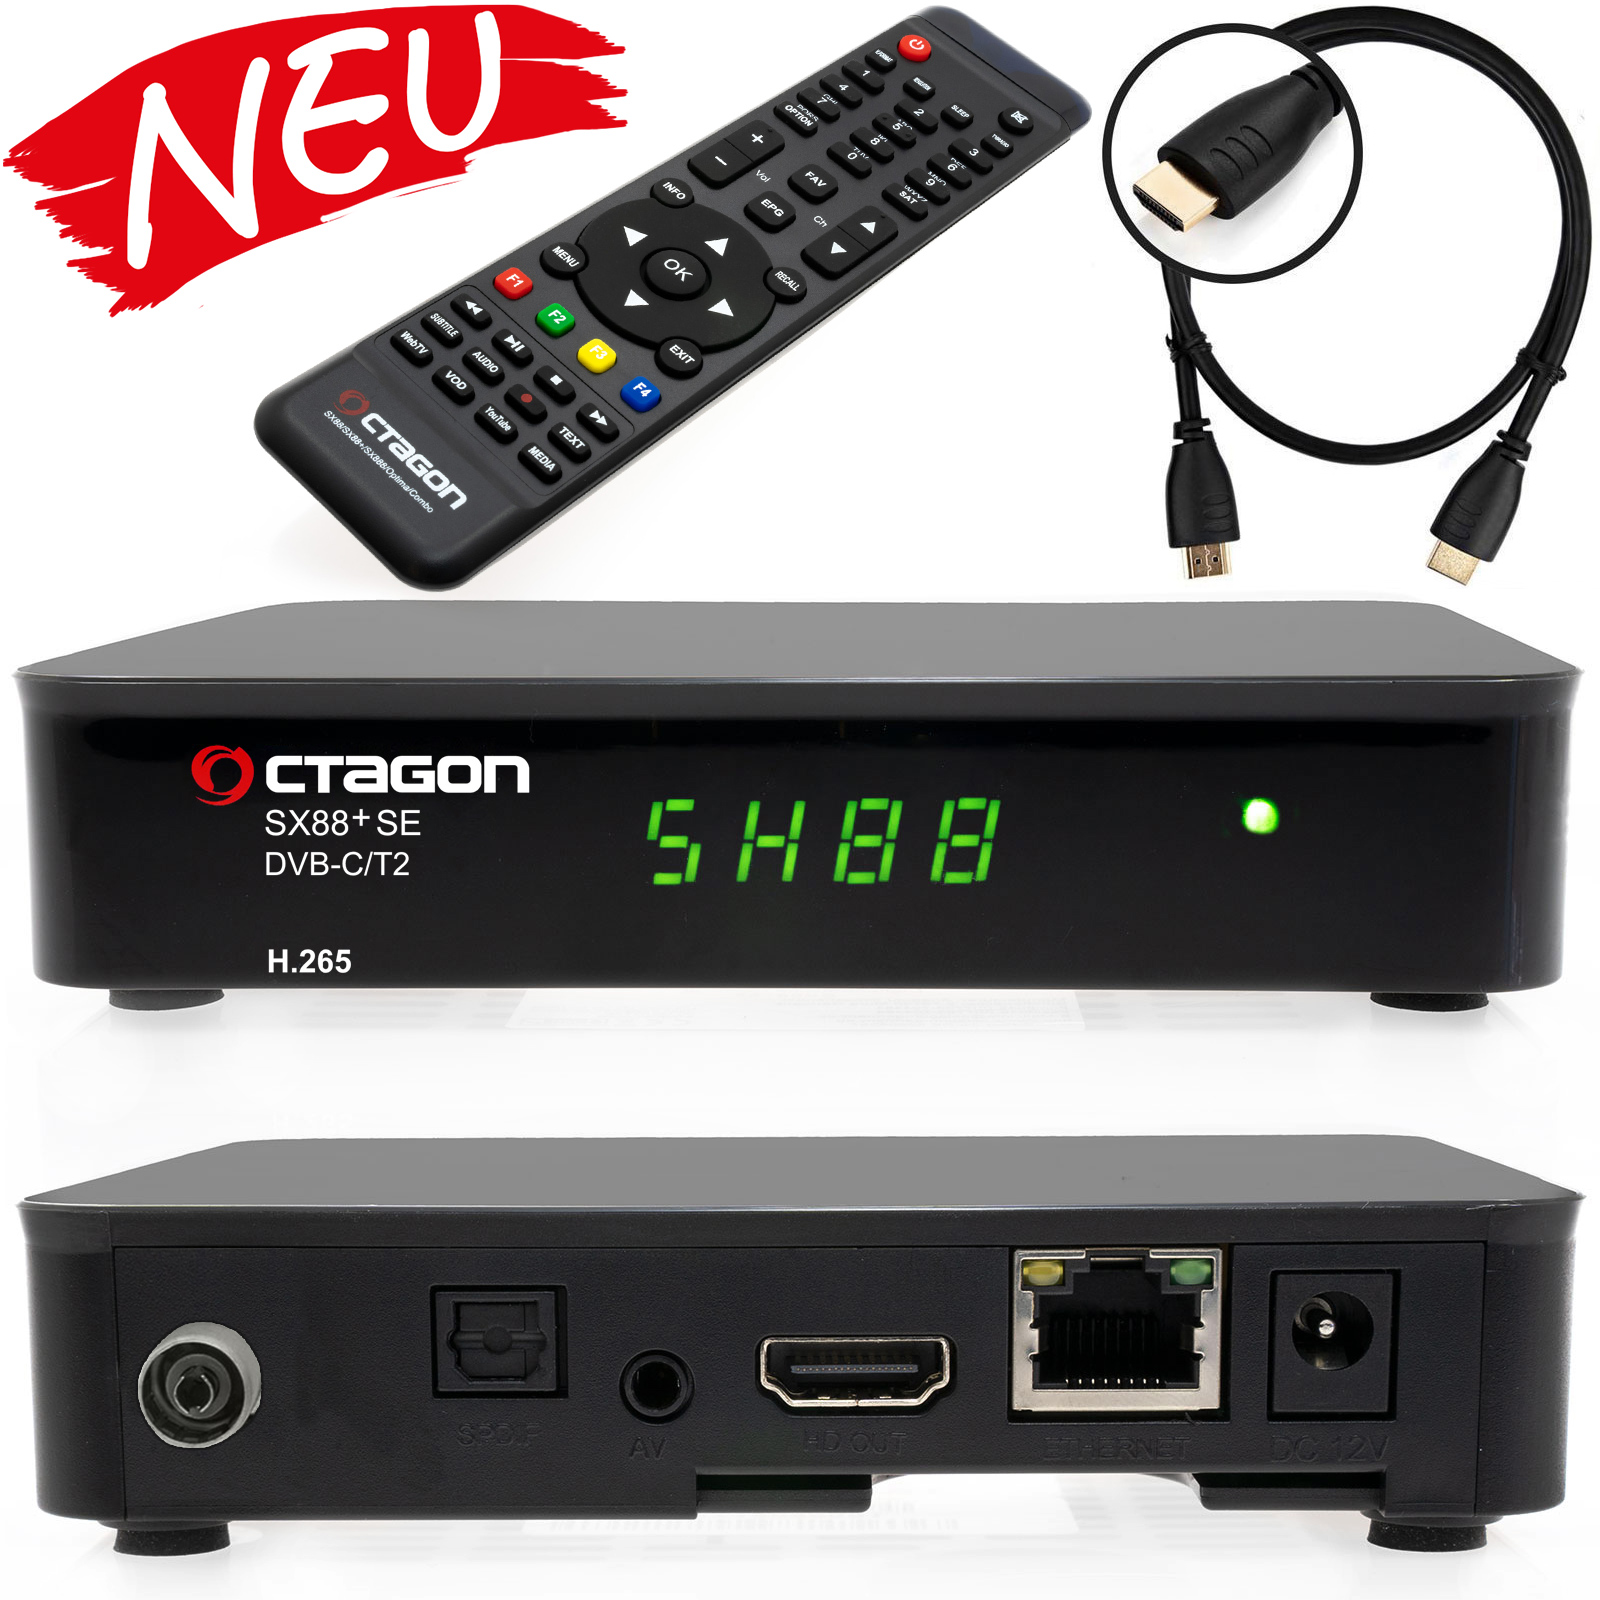 Octagon SX88+ SE H265 Multistream HD Kabel Receiver DVB-C/T2